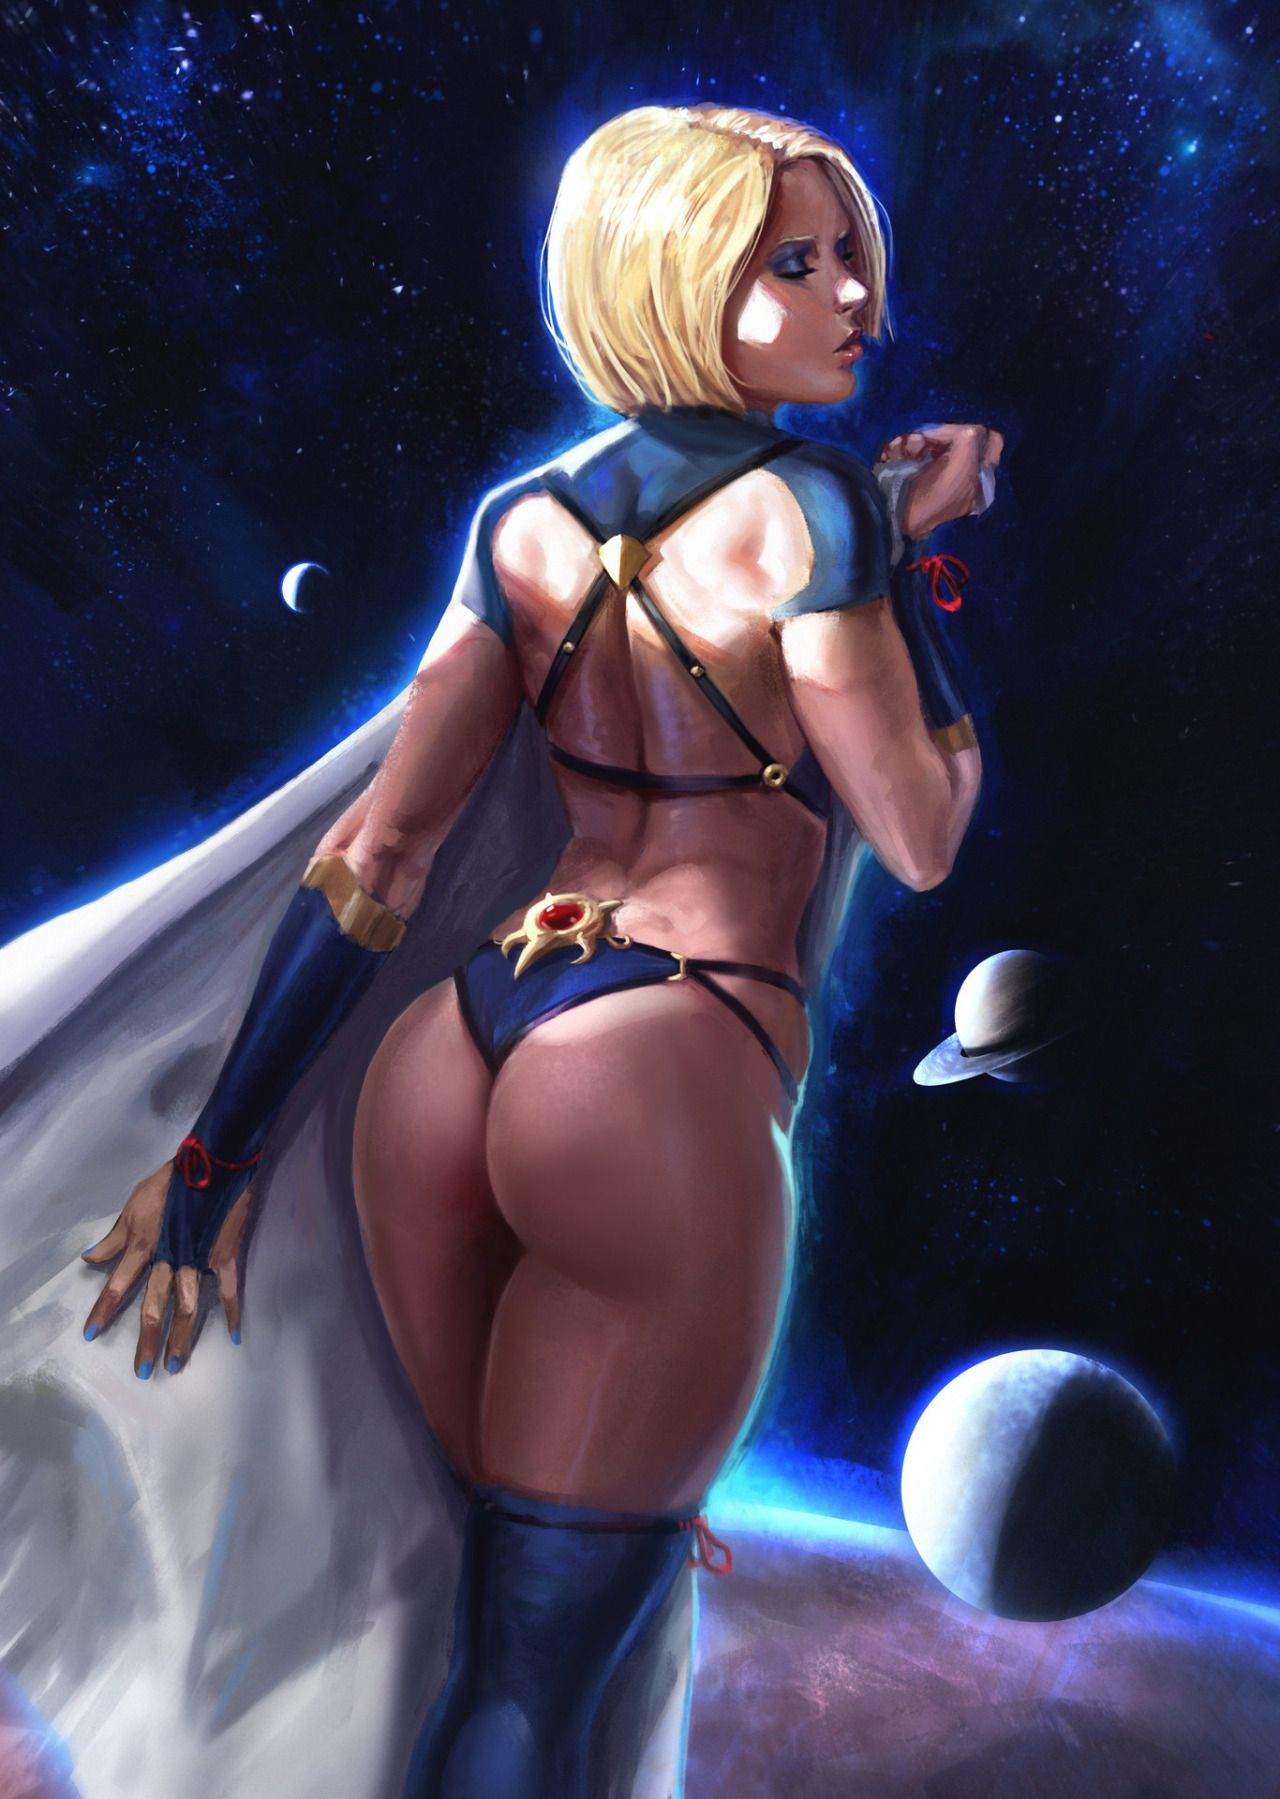 Naked scifi cartoon girls 12